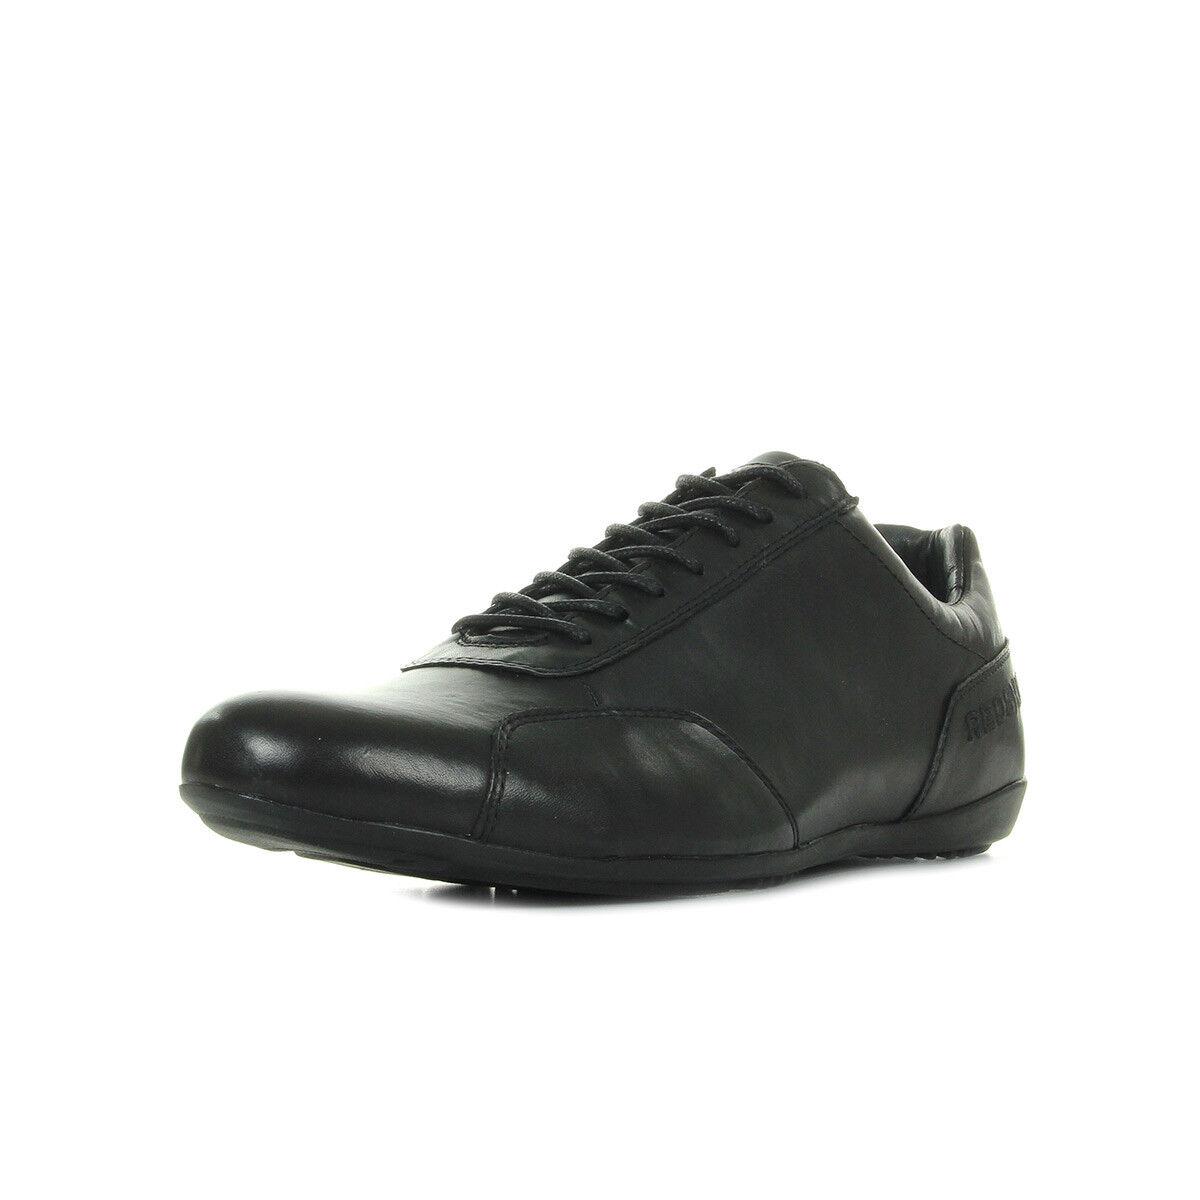 shoes Baskets Redskins homme Guiz 508 black size blacke Cuir Lacets